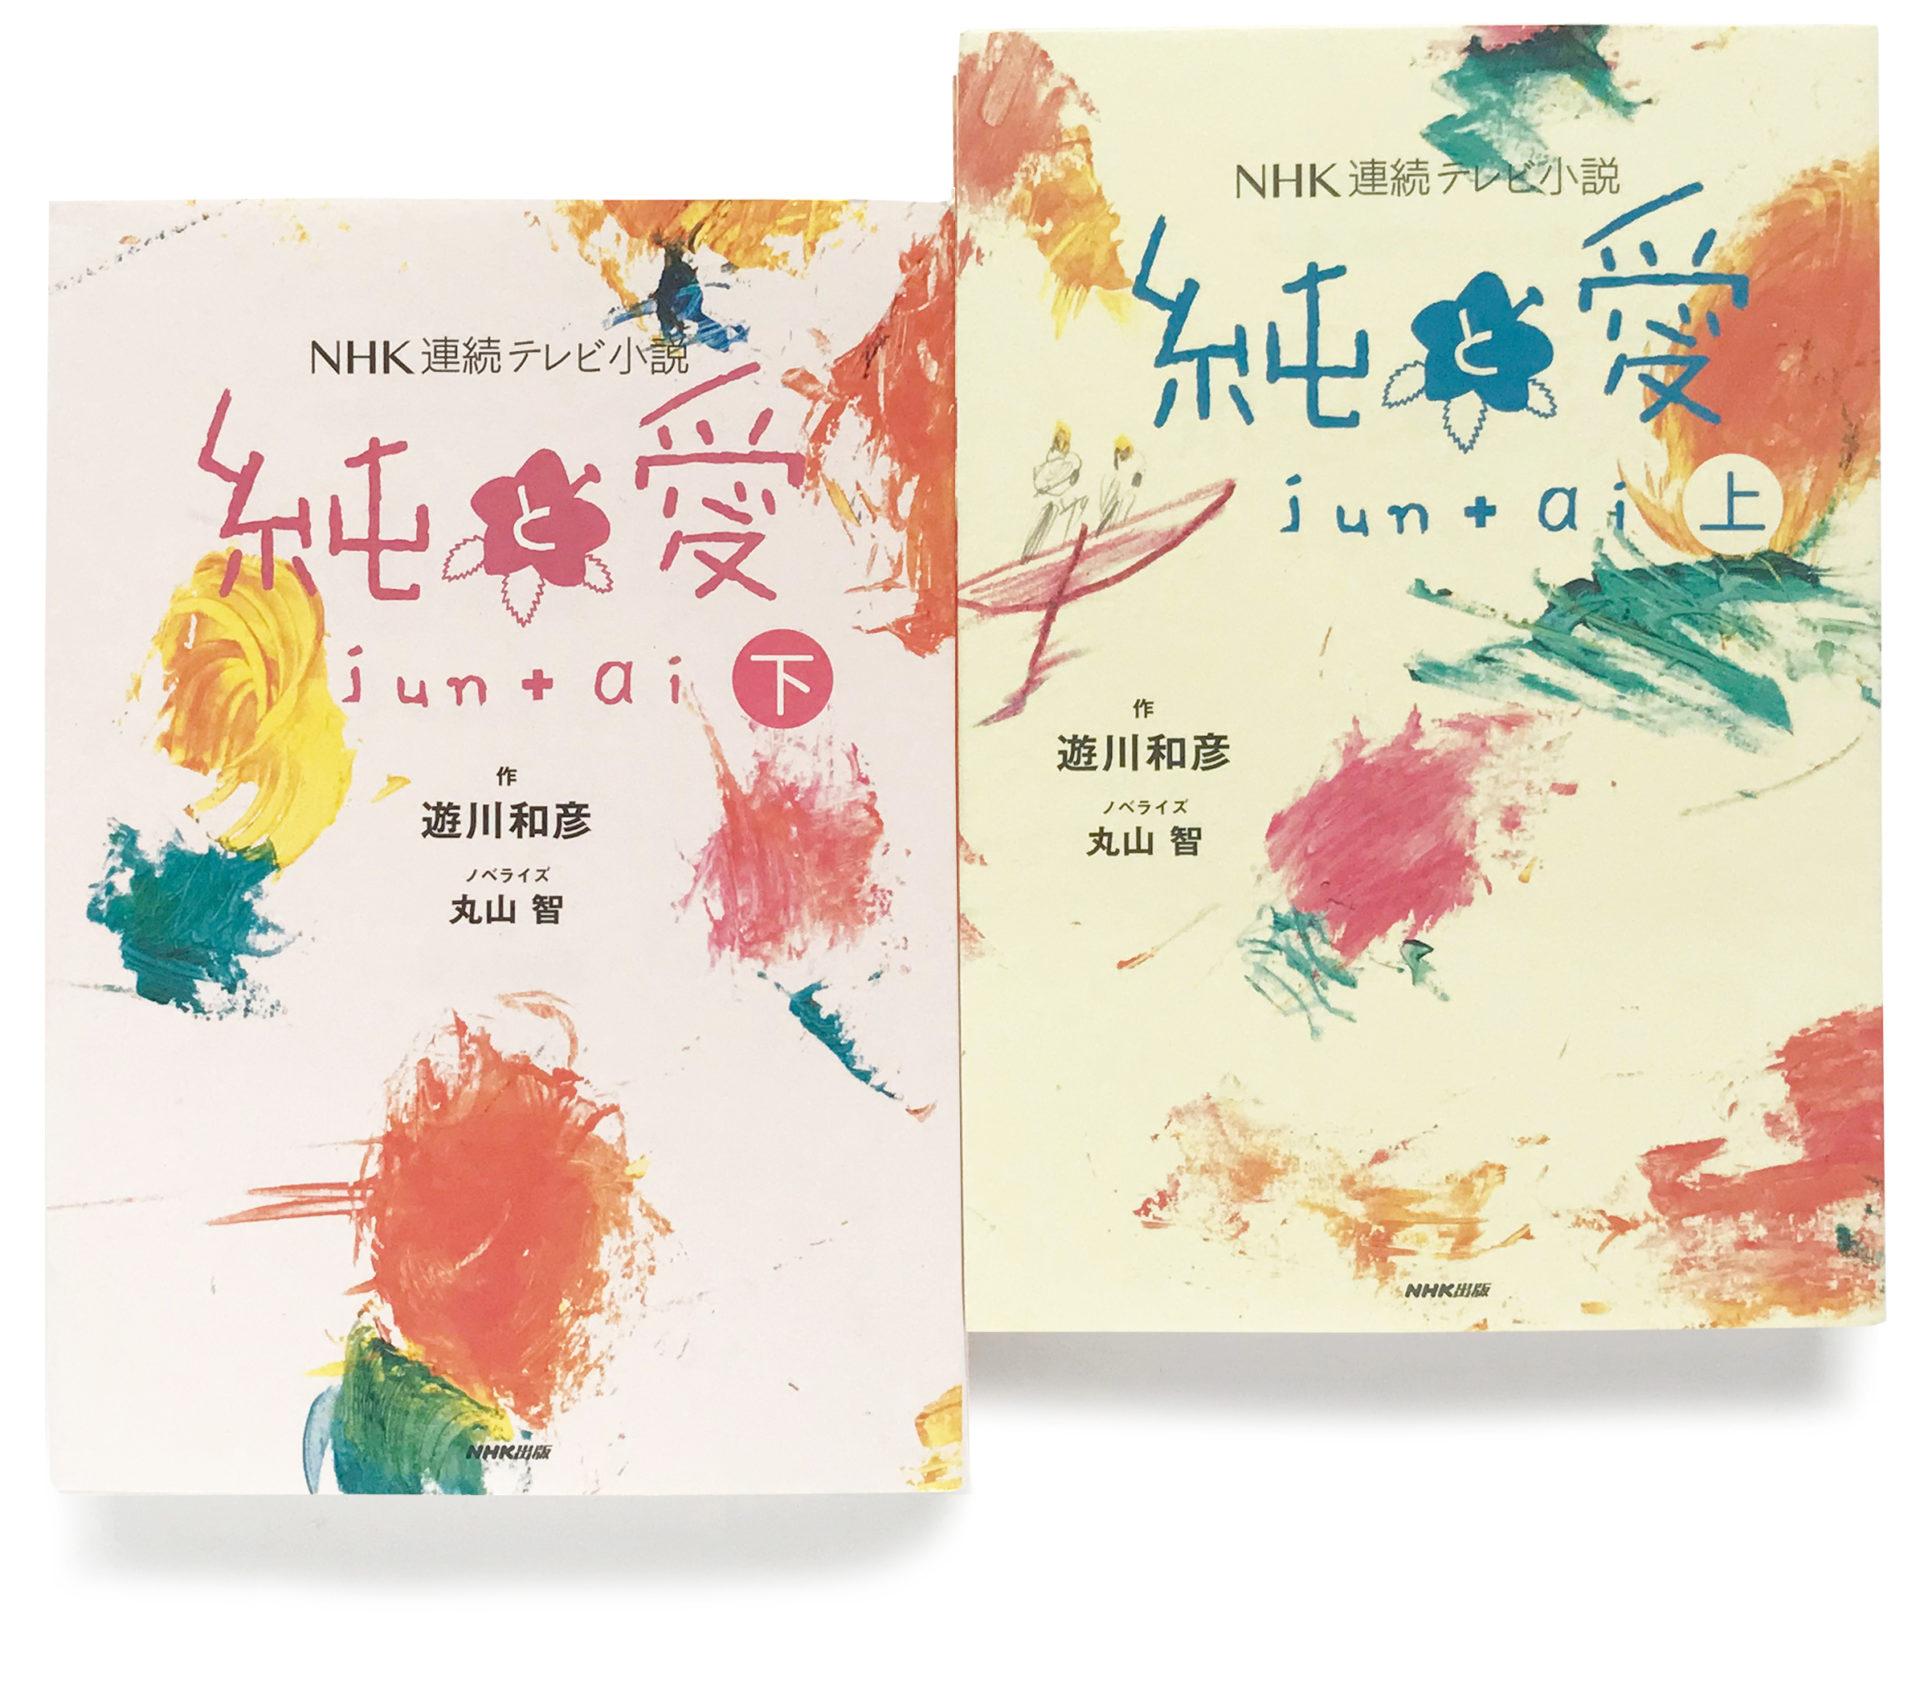 NHKドラマ・ガイド『連続テレビ小説 純と愛』 5